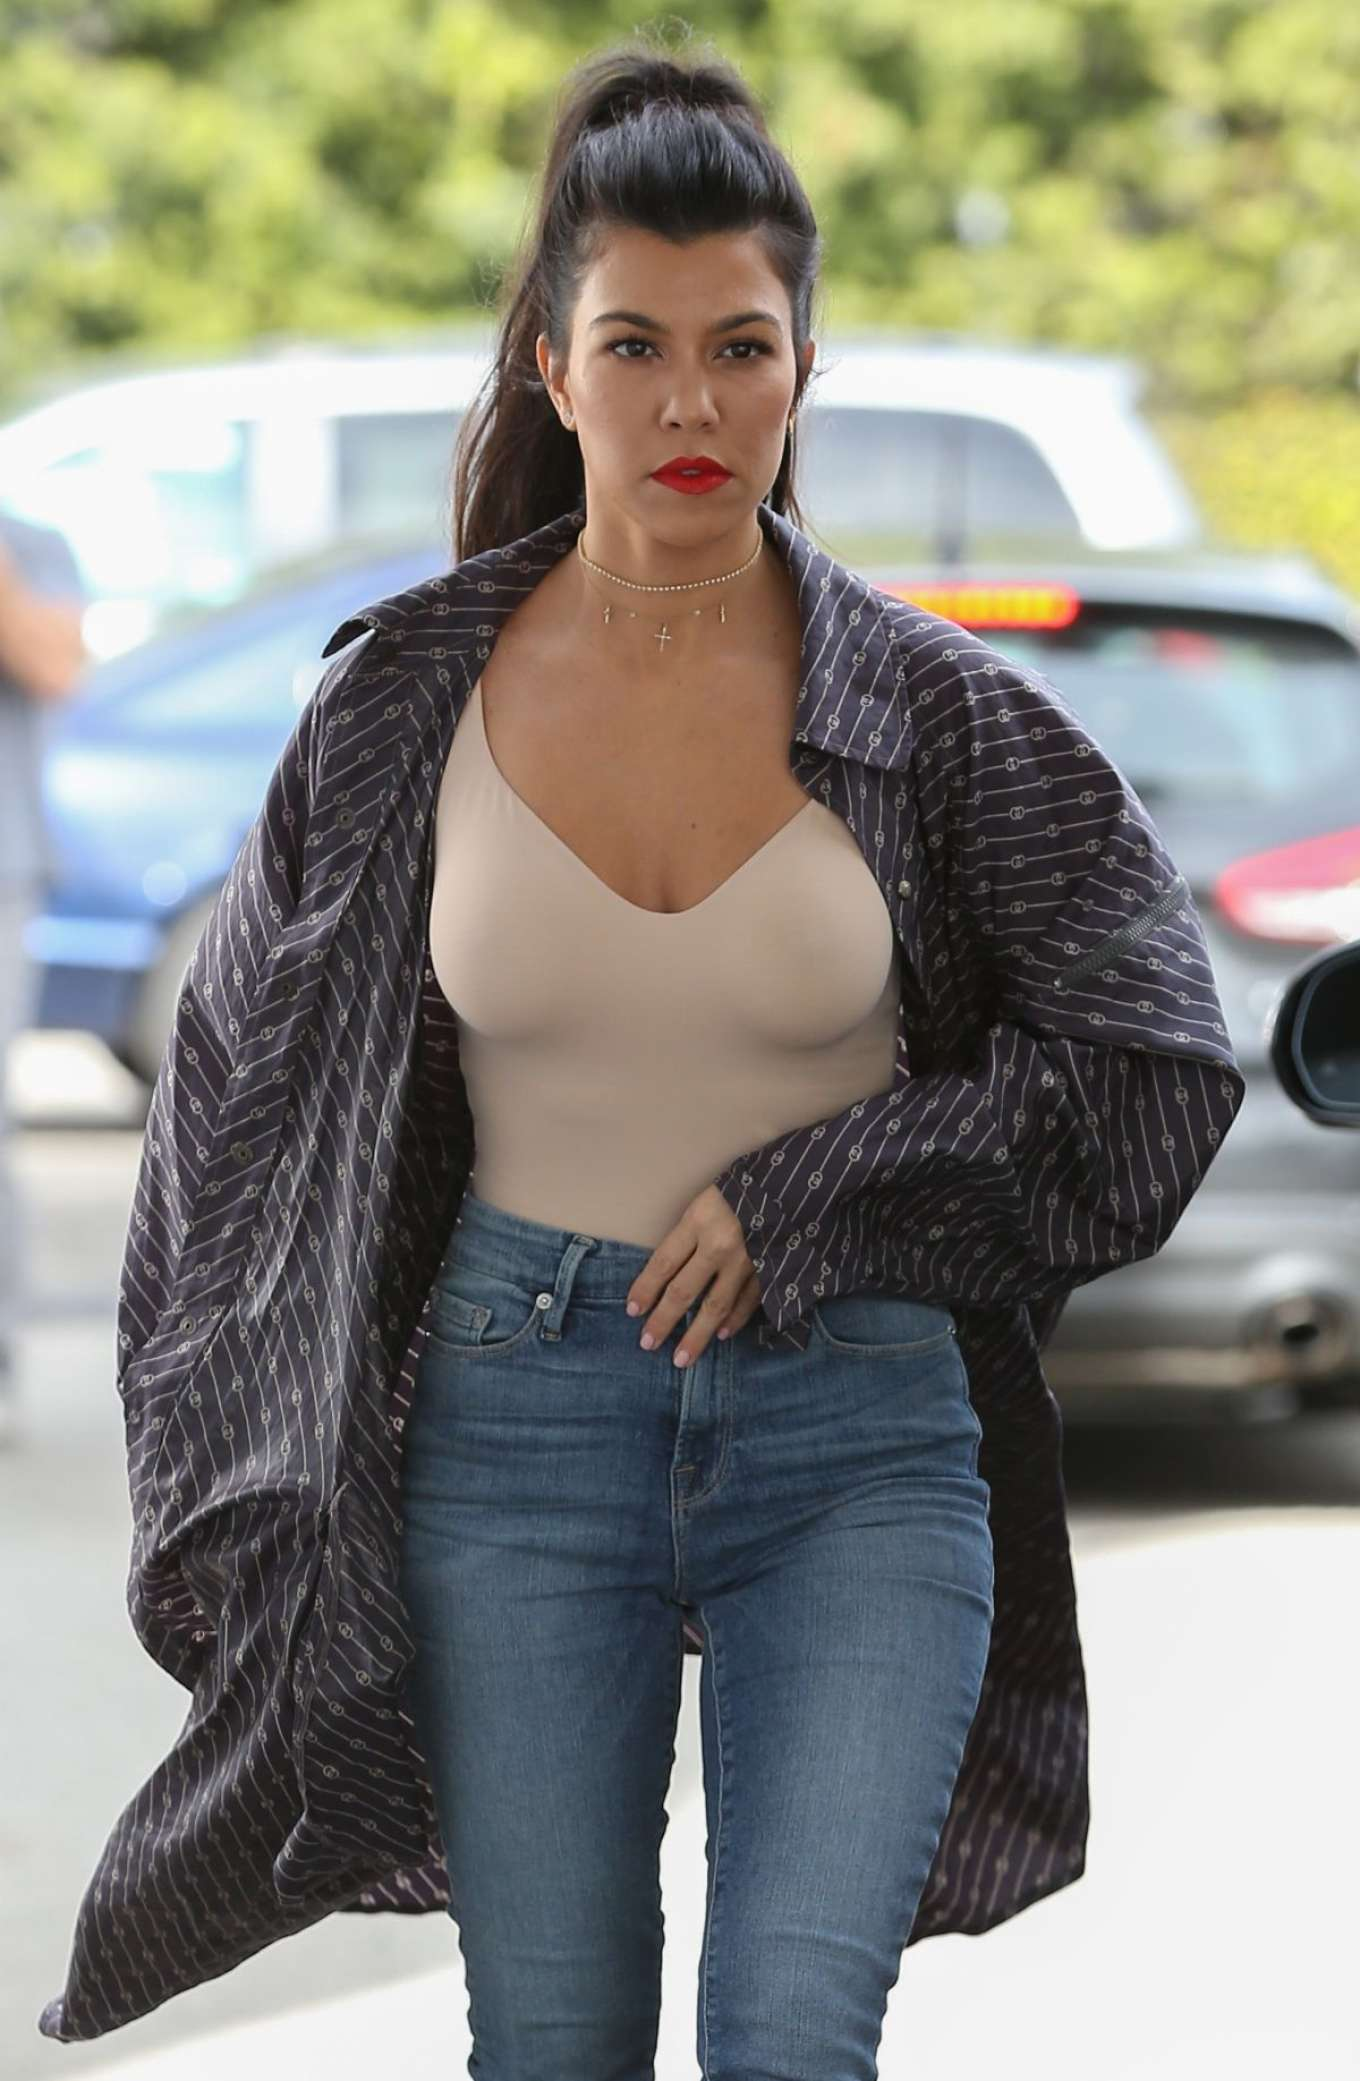 kourtney kardashian in jeans arrives at casa vega in